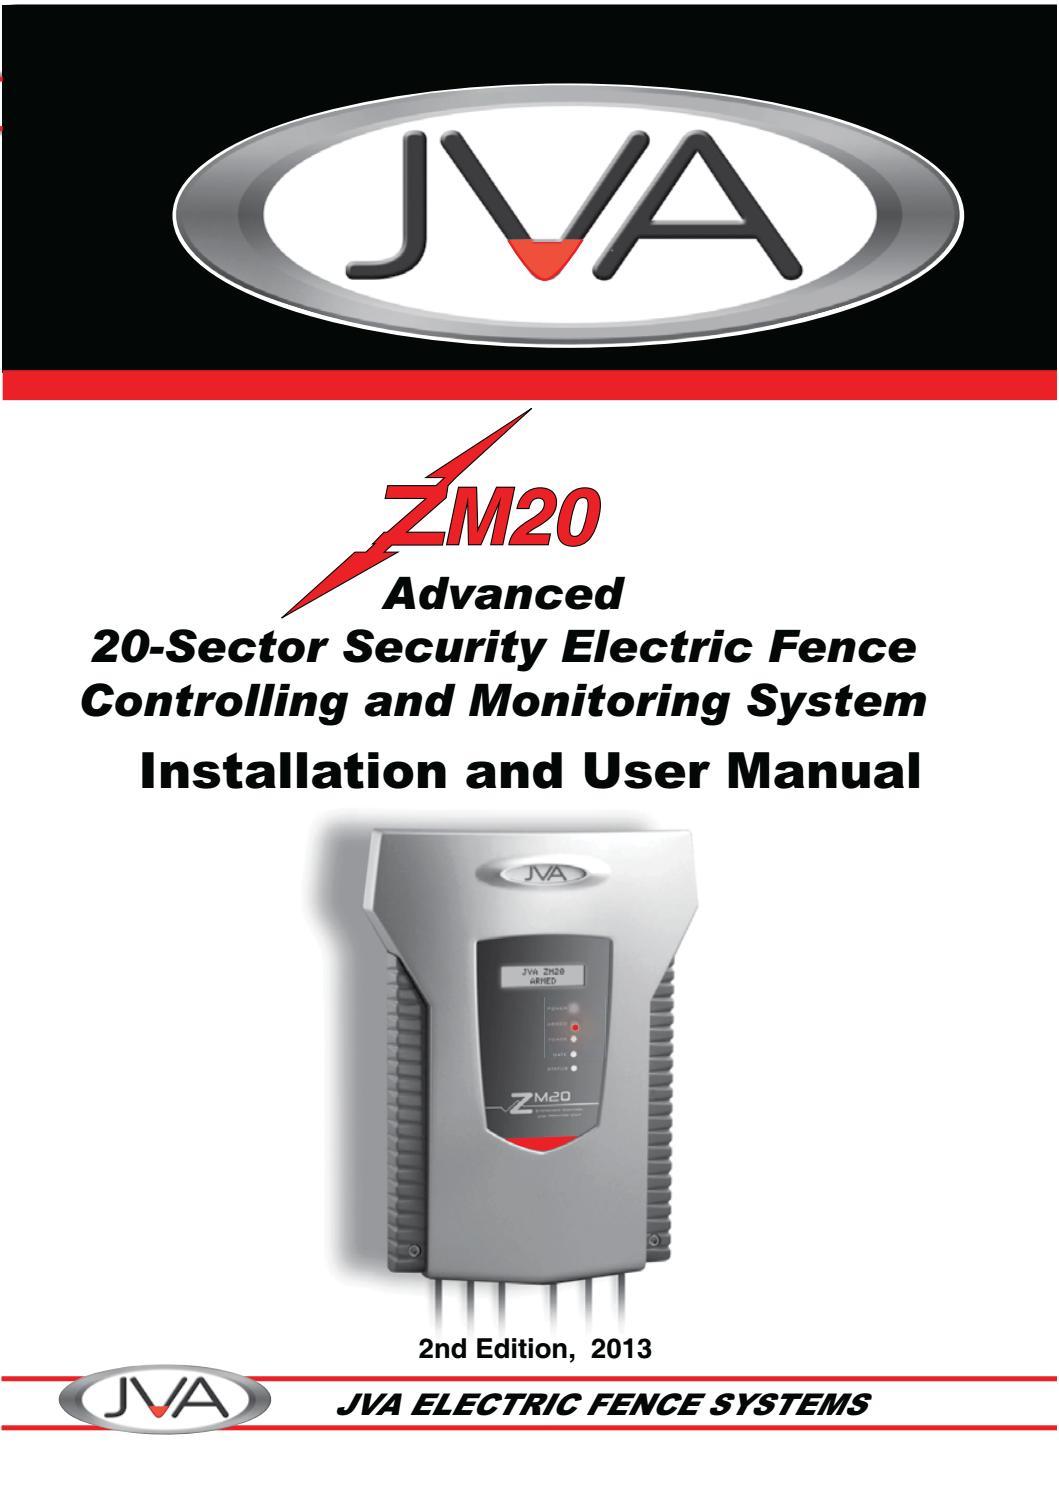 Jva Zm20 Manual By Ndlovu Fencing Issuu Mains Powered Energizers